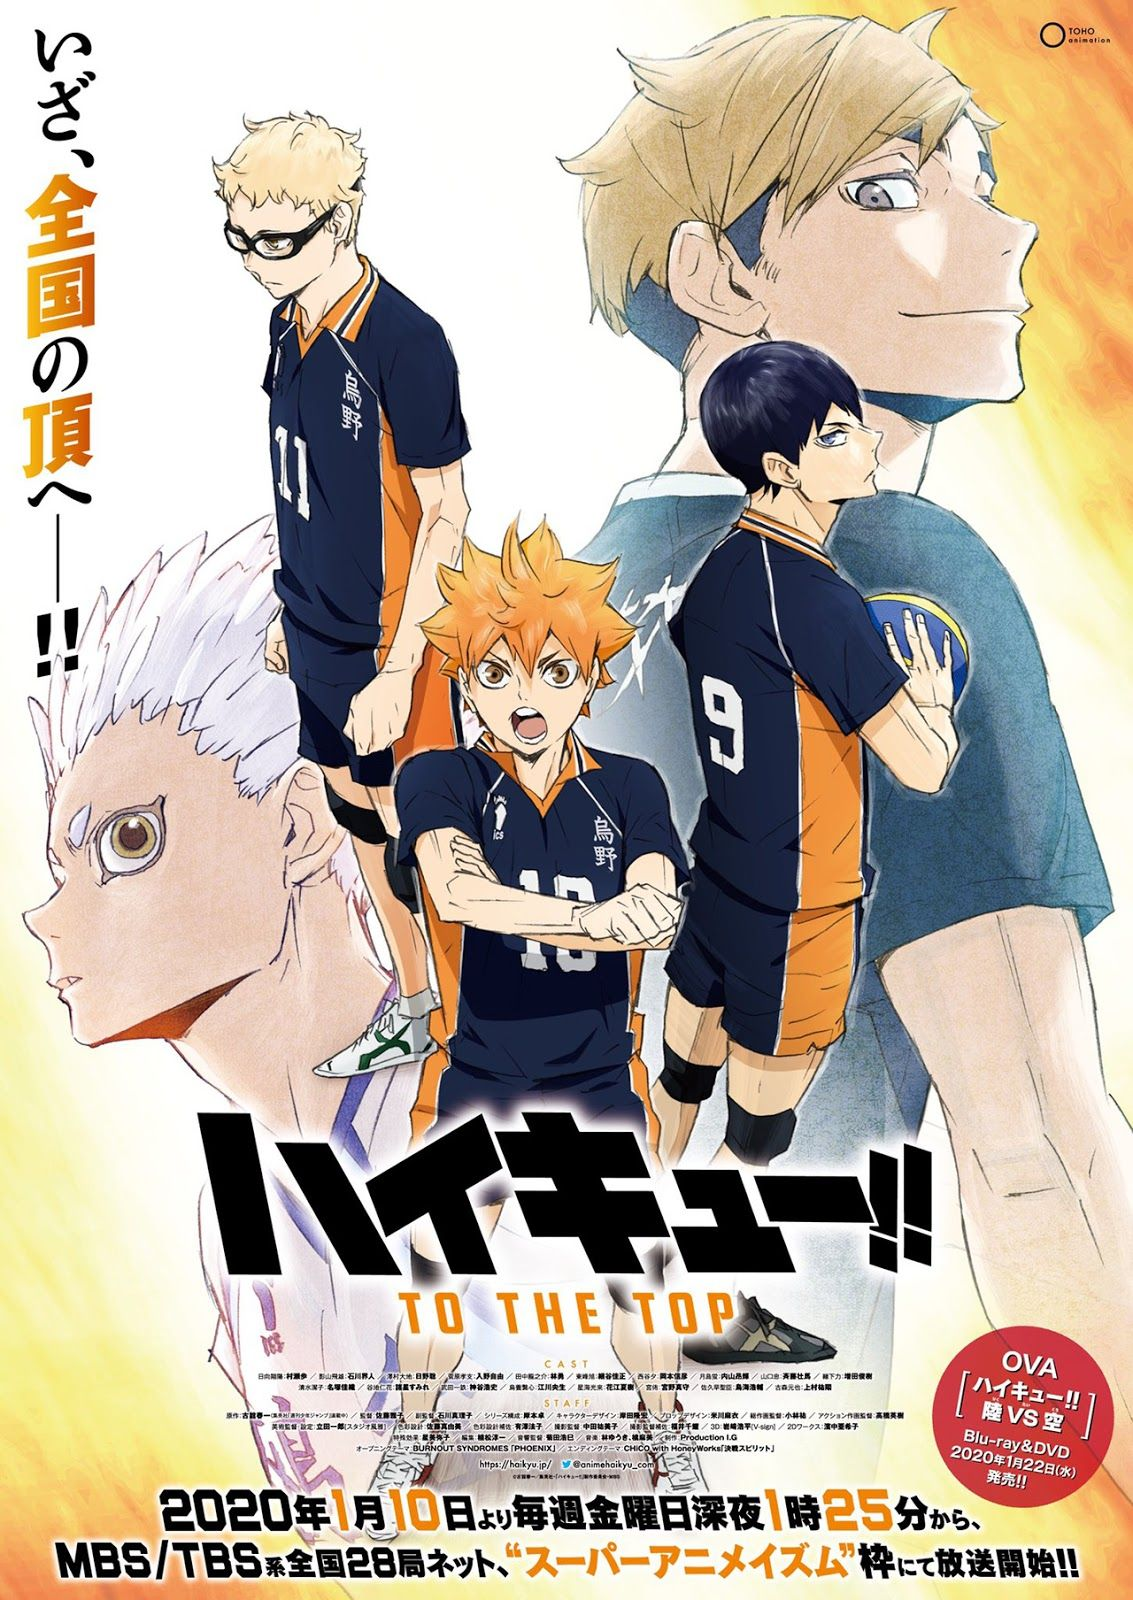 El anime ''Haikyuu! To The Top'', estrena póster oficial